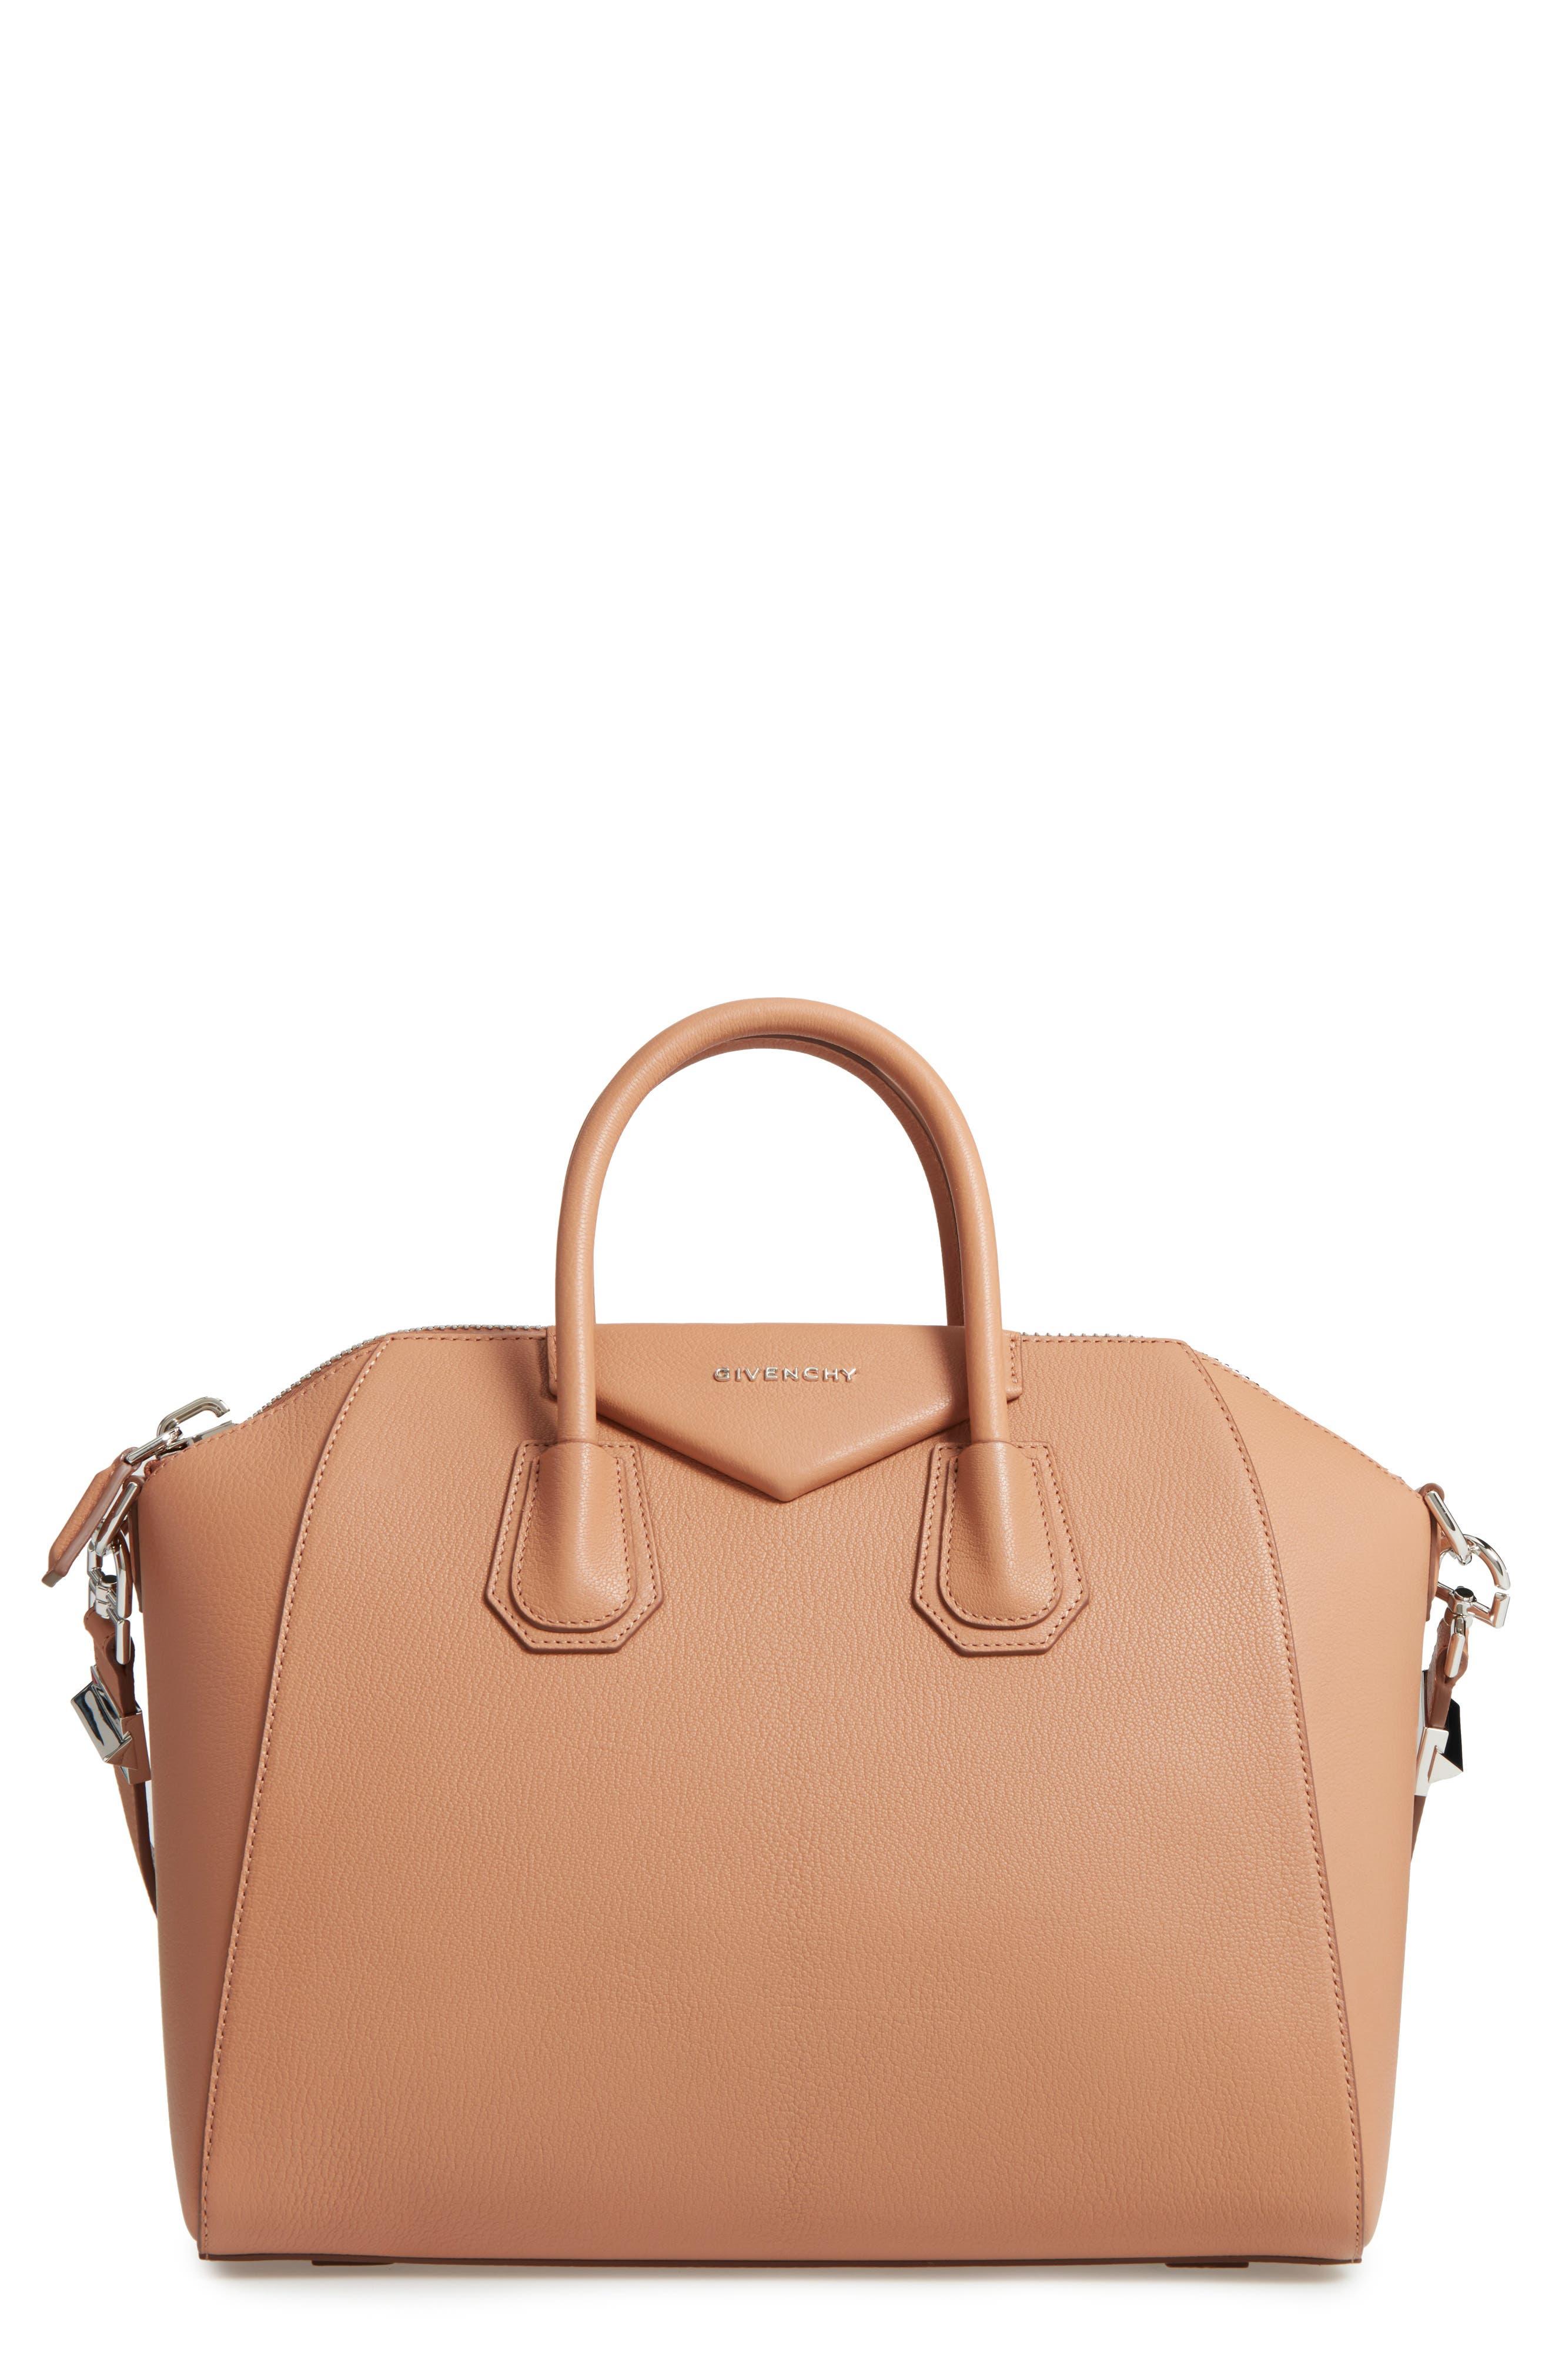 Givenchy 'Medium Antigona' Sugar Leather Satchel